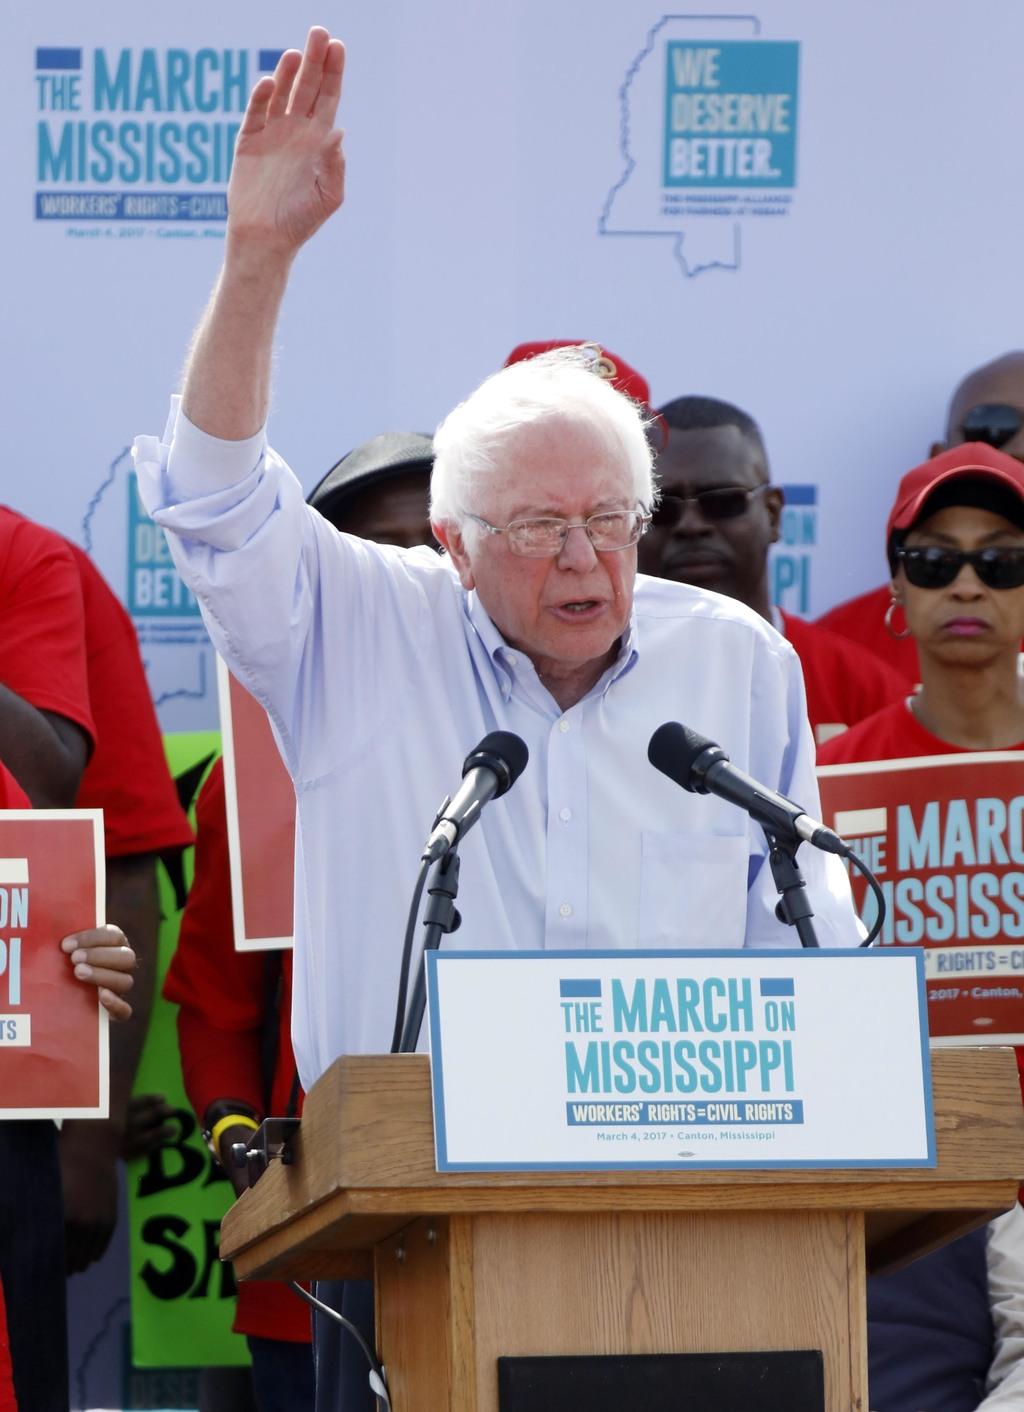 U.S. Sen. Bernie Sanders, I-Vt, tells thousands at a pro-union rally near Nissan Motor Co.'s Canton, Miss., plant, Saturday, March 4, 2...